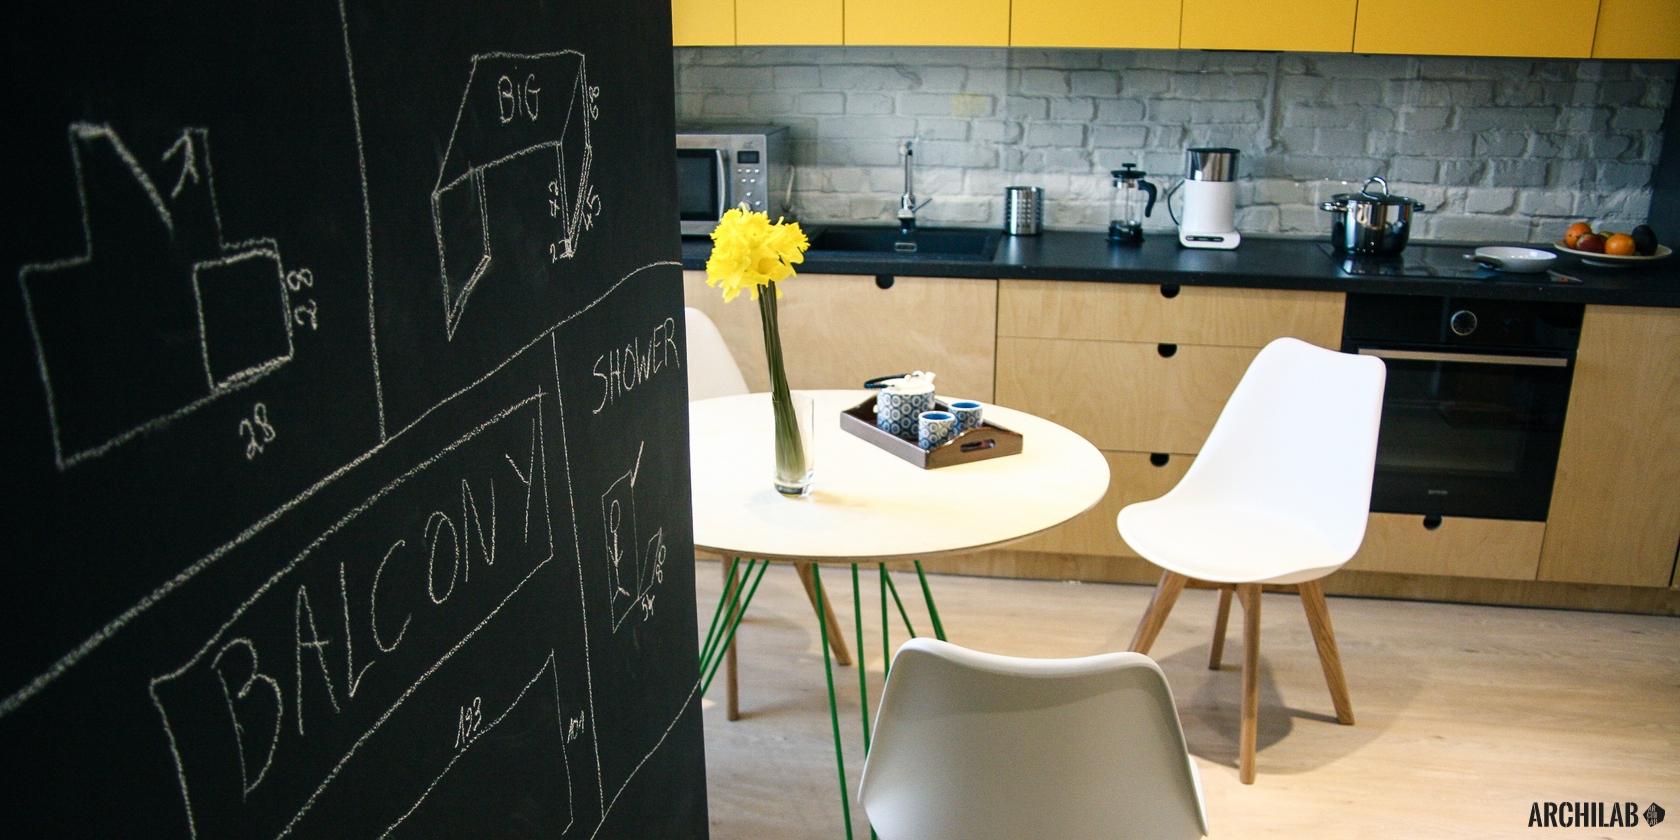 preco-oslovit-architekta-industrialny-interier-rekonstrukcia-tehlova-stena-tabulova-farba-moderna-kuchyna-02